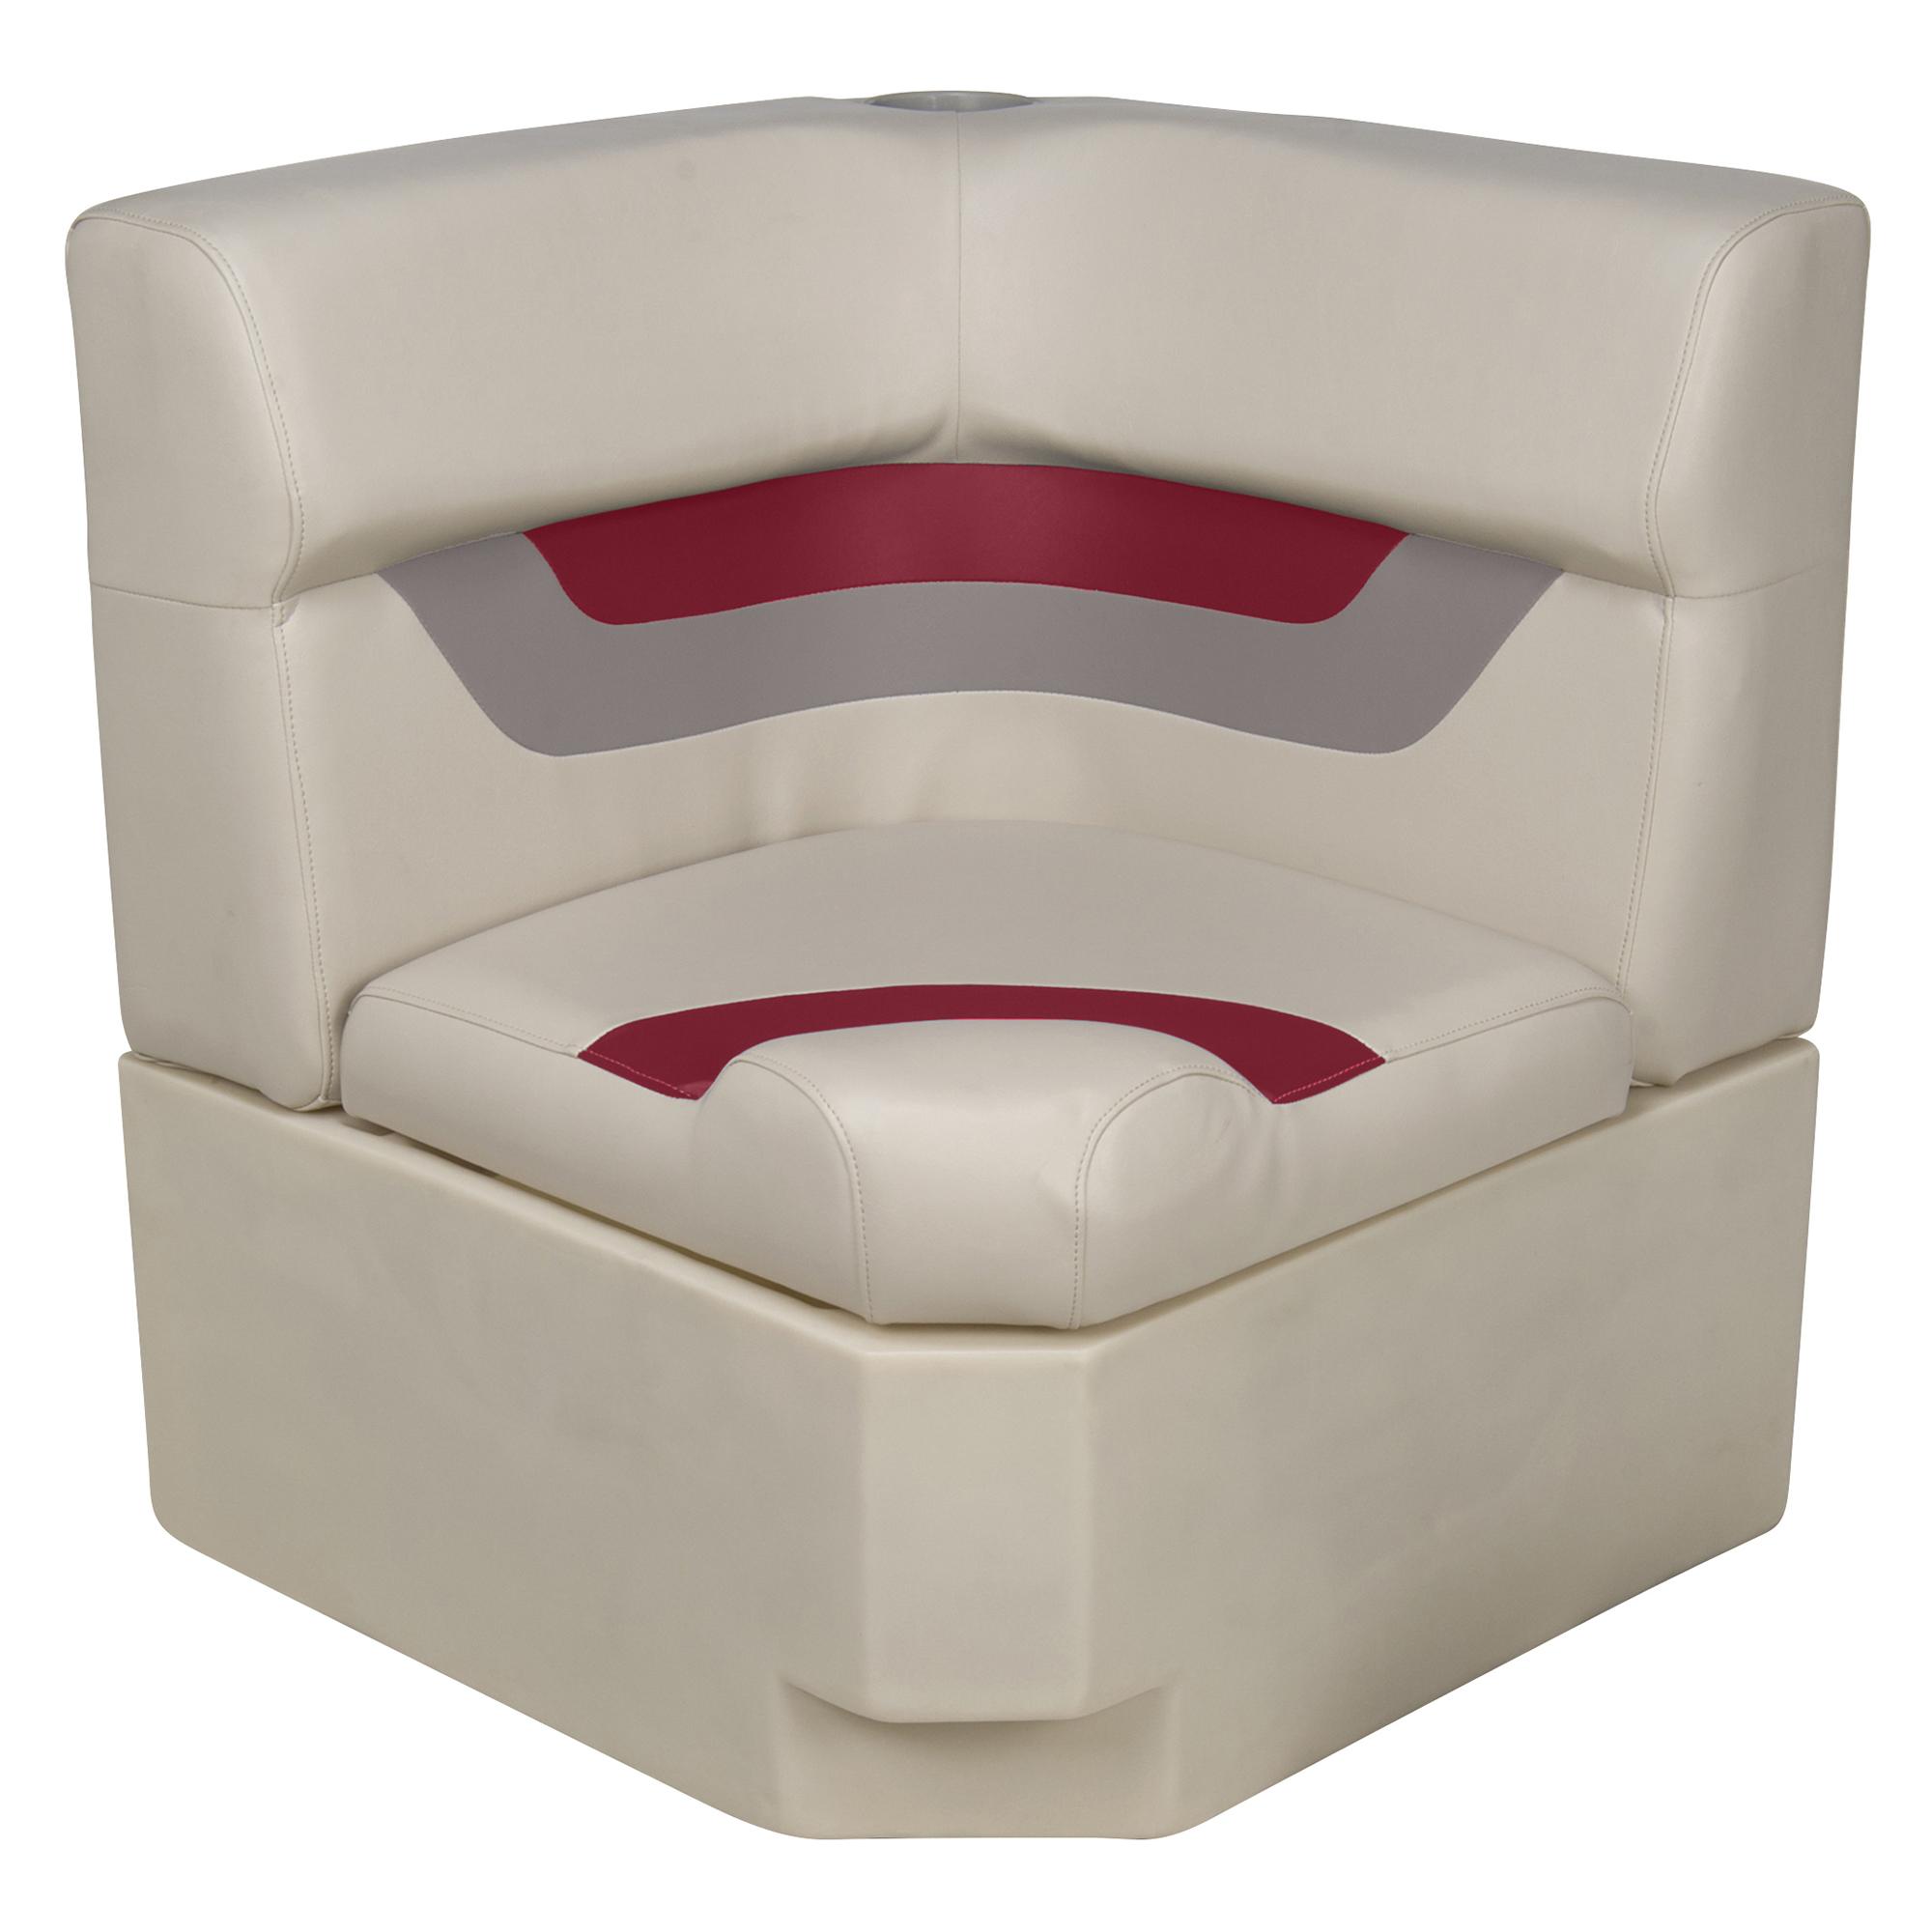 Toonmate Designer Pontoon Corner Section Seat - TOP ONLY